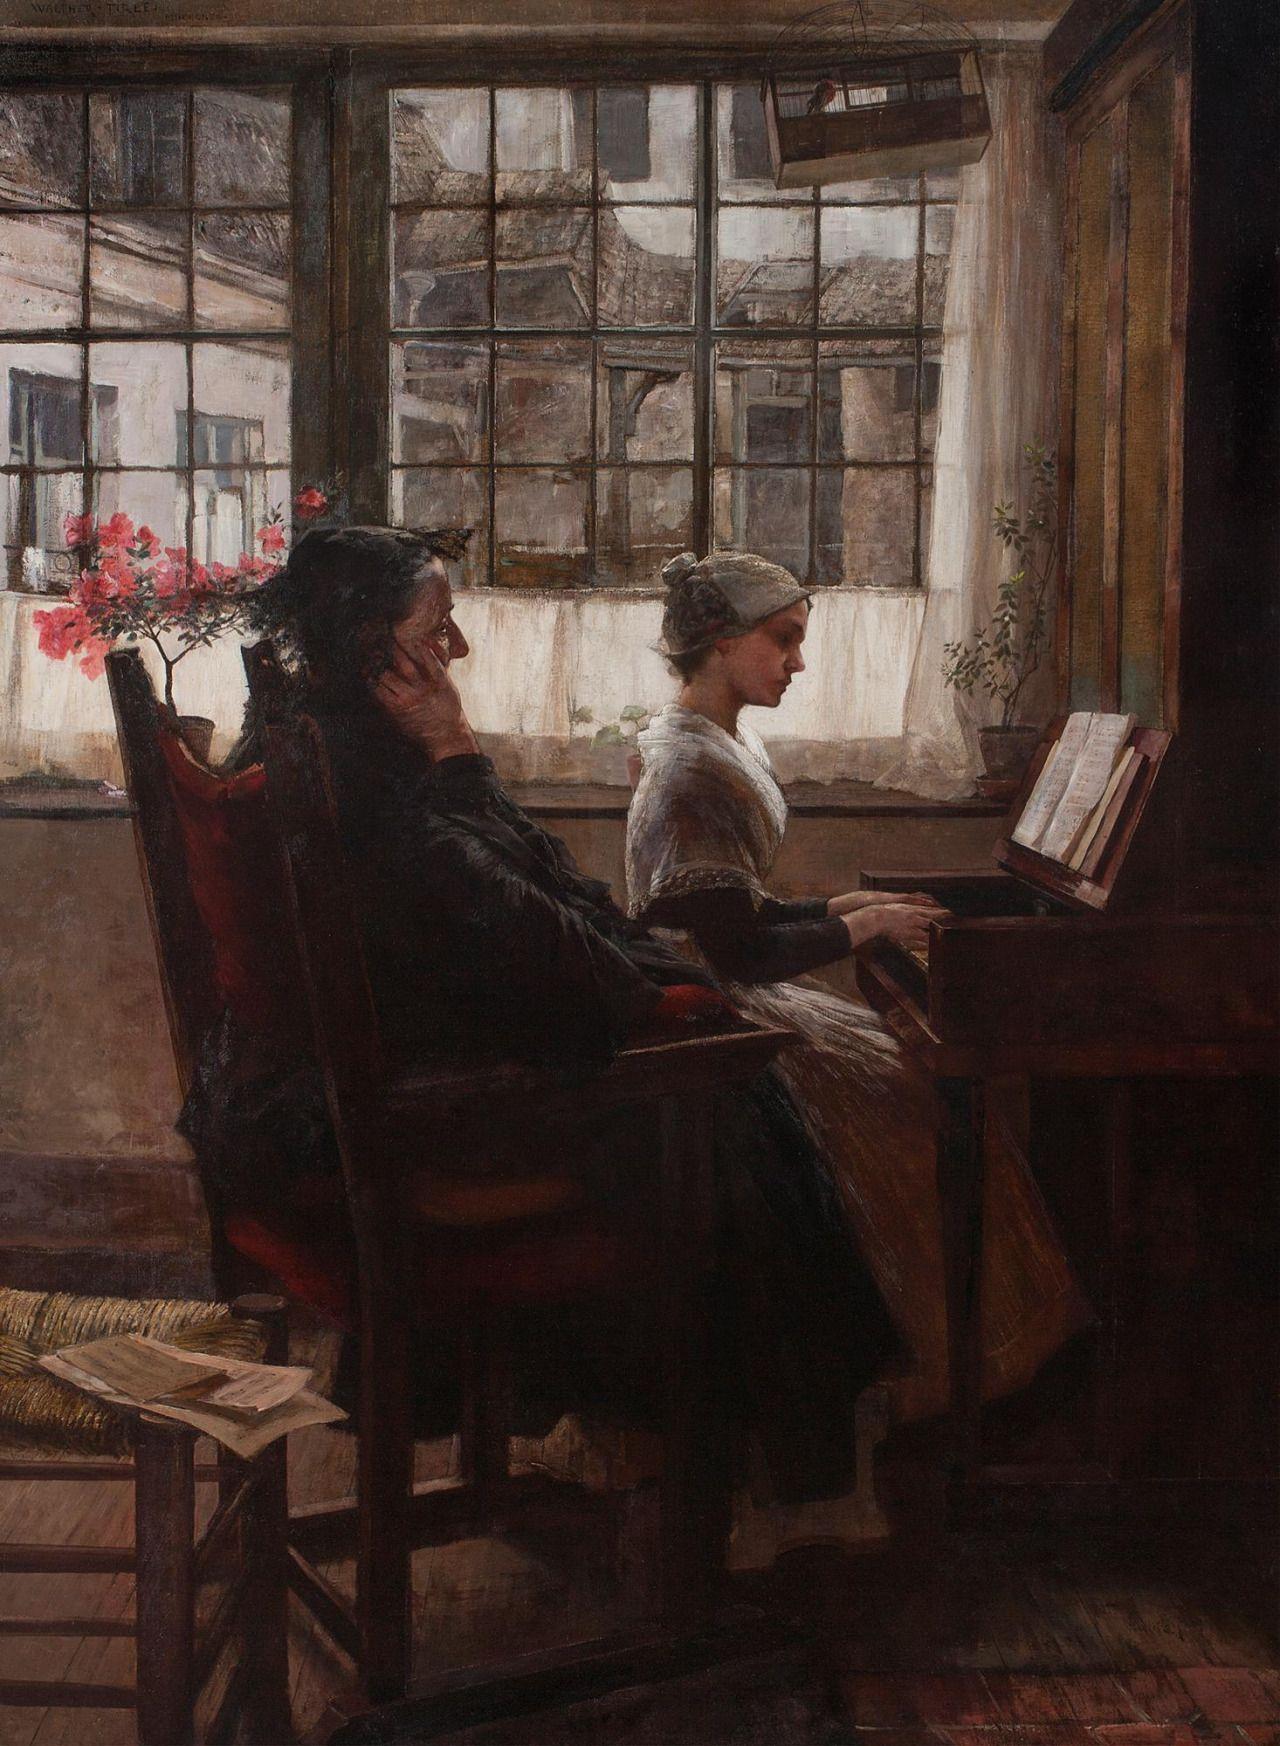 Catonhottinroof Walter Firle 1859 1929 An Old Song Vintage Music Art Art Music Musical Art